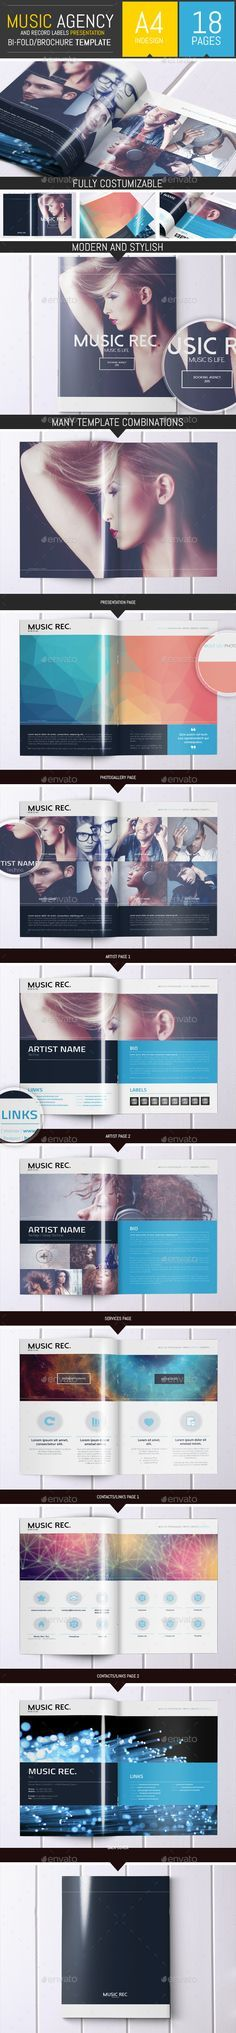 Ukuran Poster Photoshop Terbaik 7 Desirable Dj Techno Images Music is Life Dj Music House Music